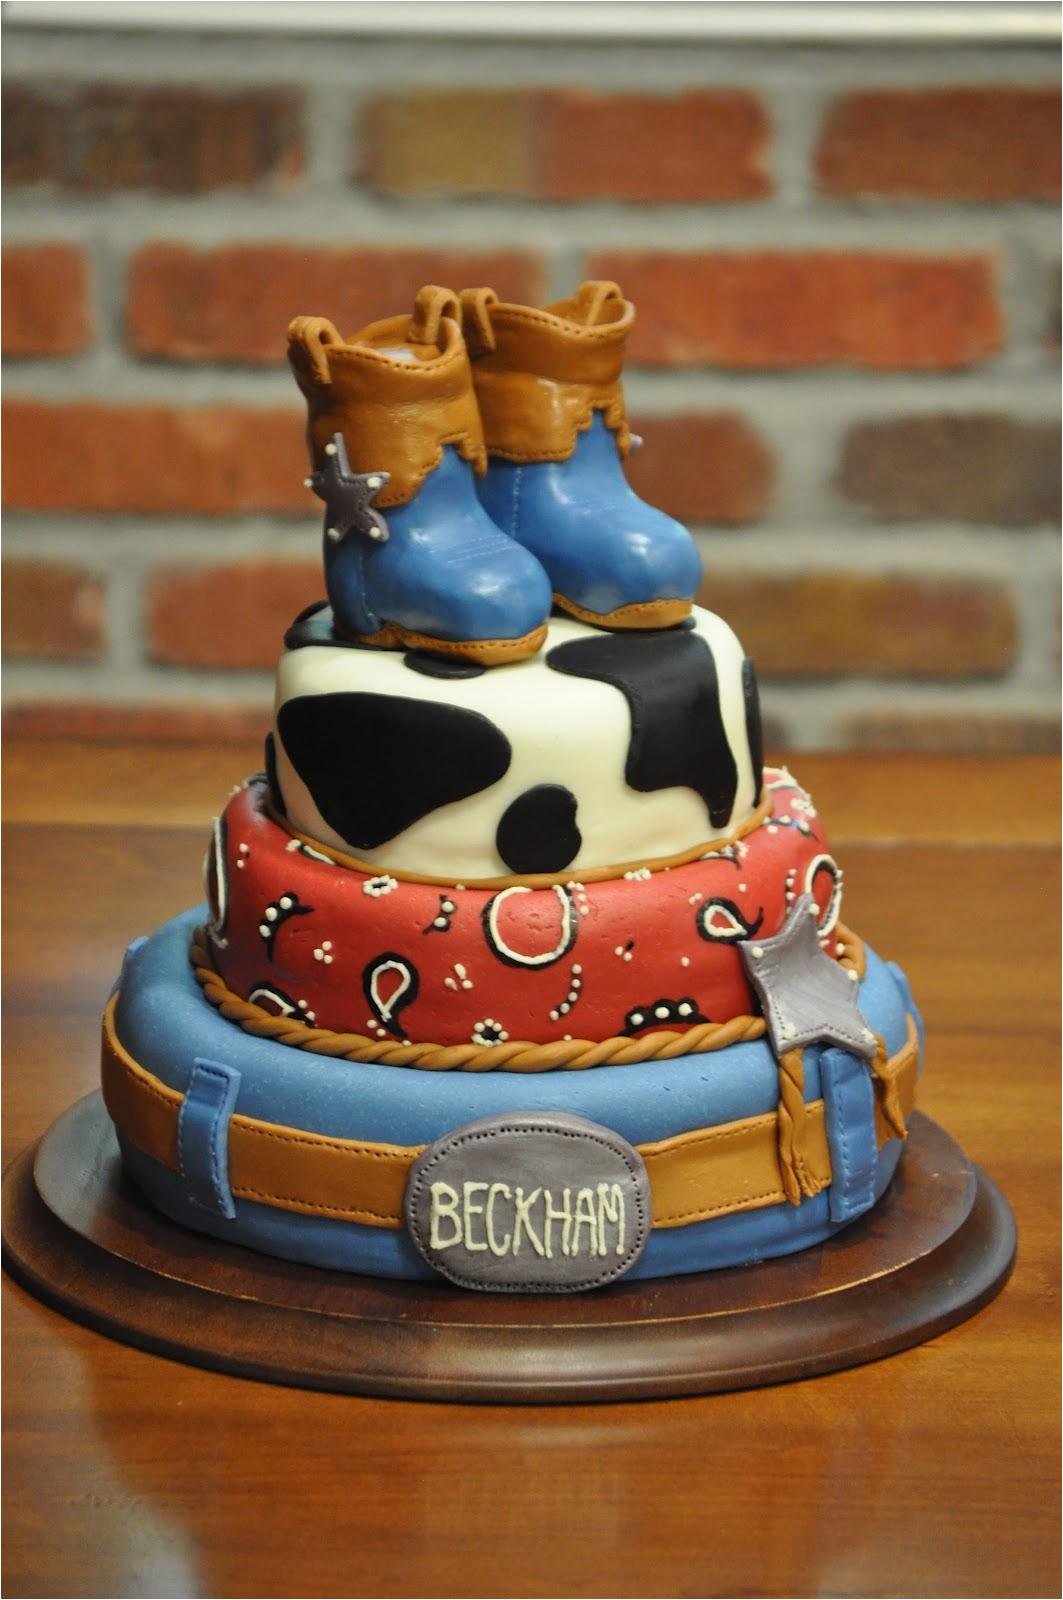 Cowboy Birthday Cake Decorations Cowboy Birthday Party Ideas events to Celebrate